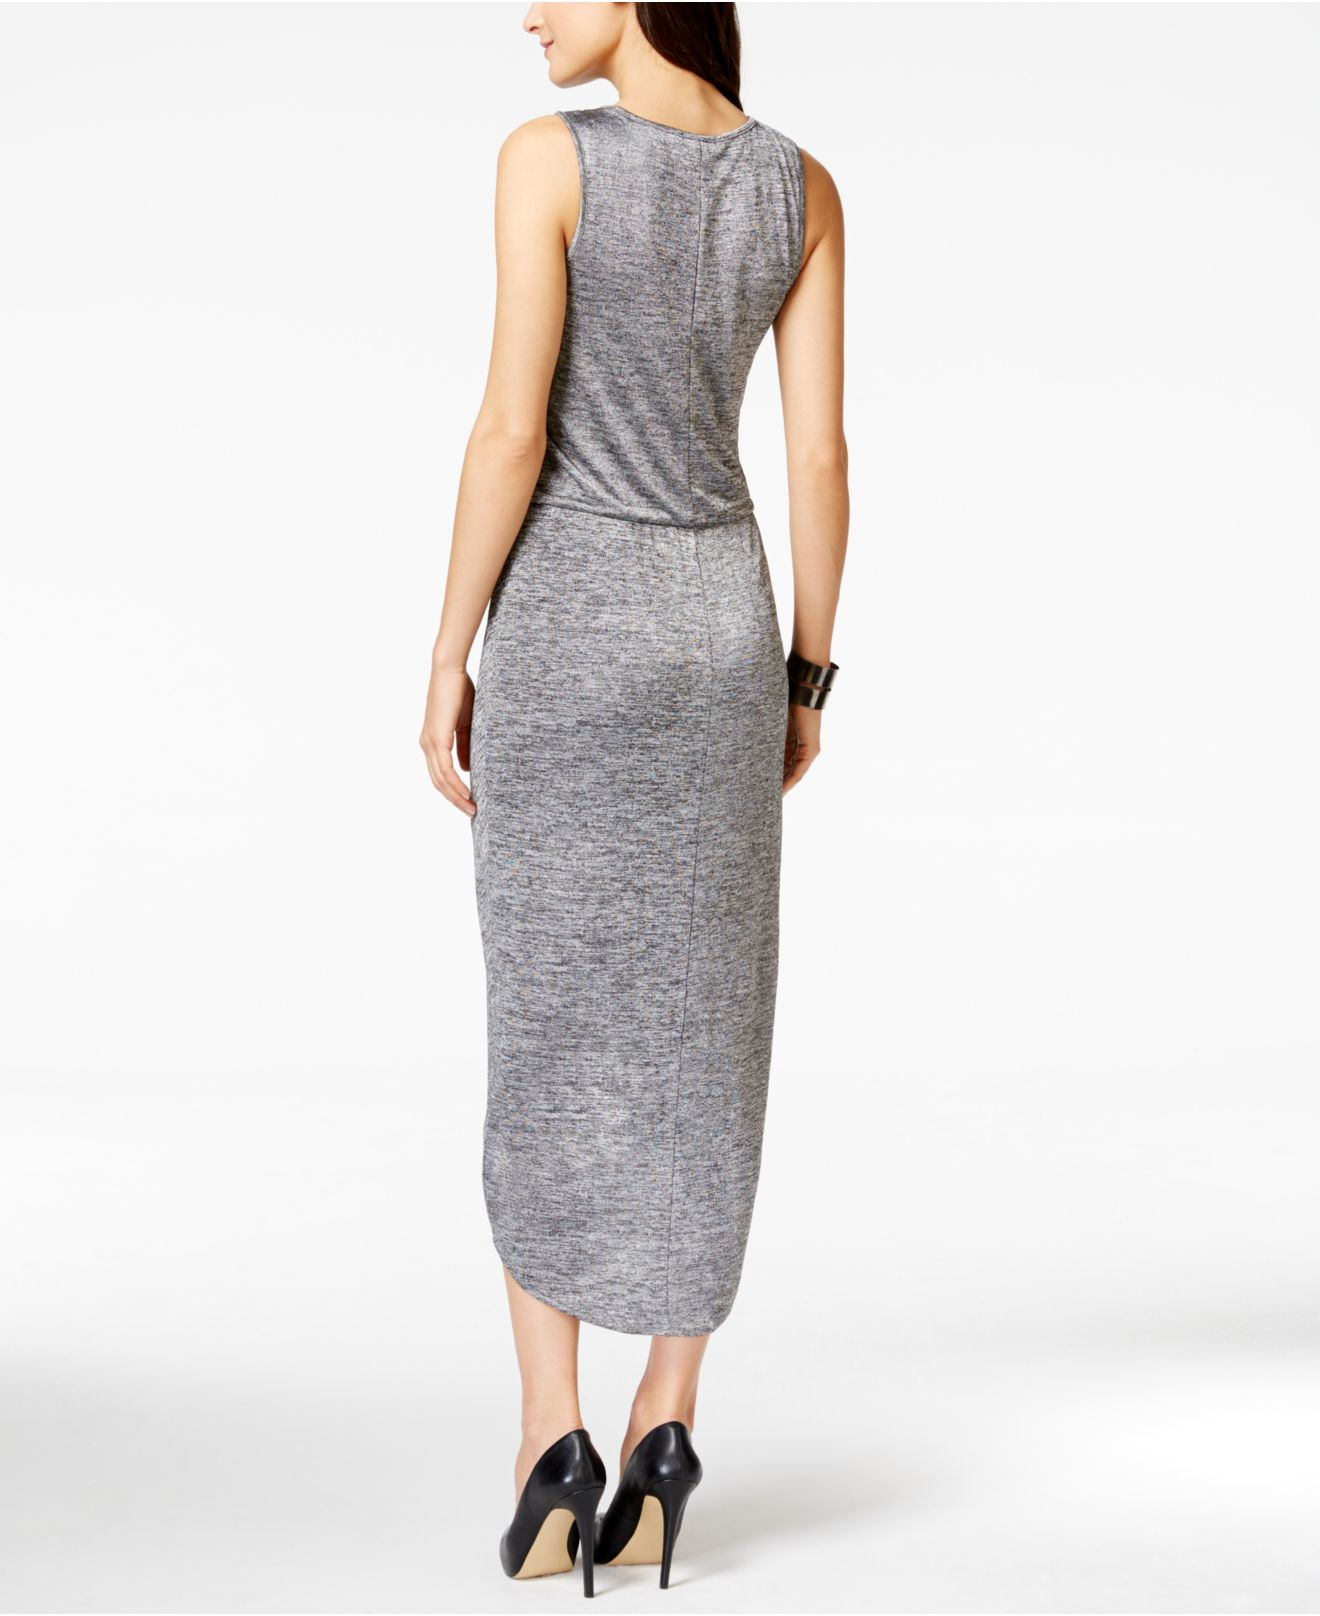 Dkny Twist-front Maxi Dress in Gray  Lyst